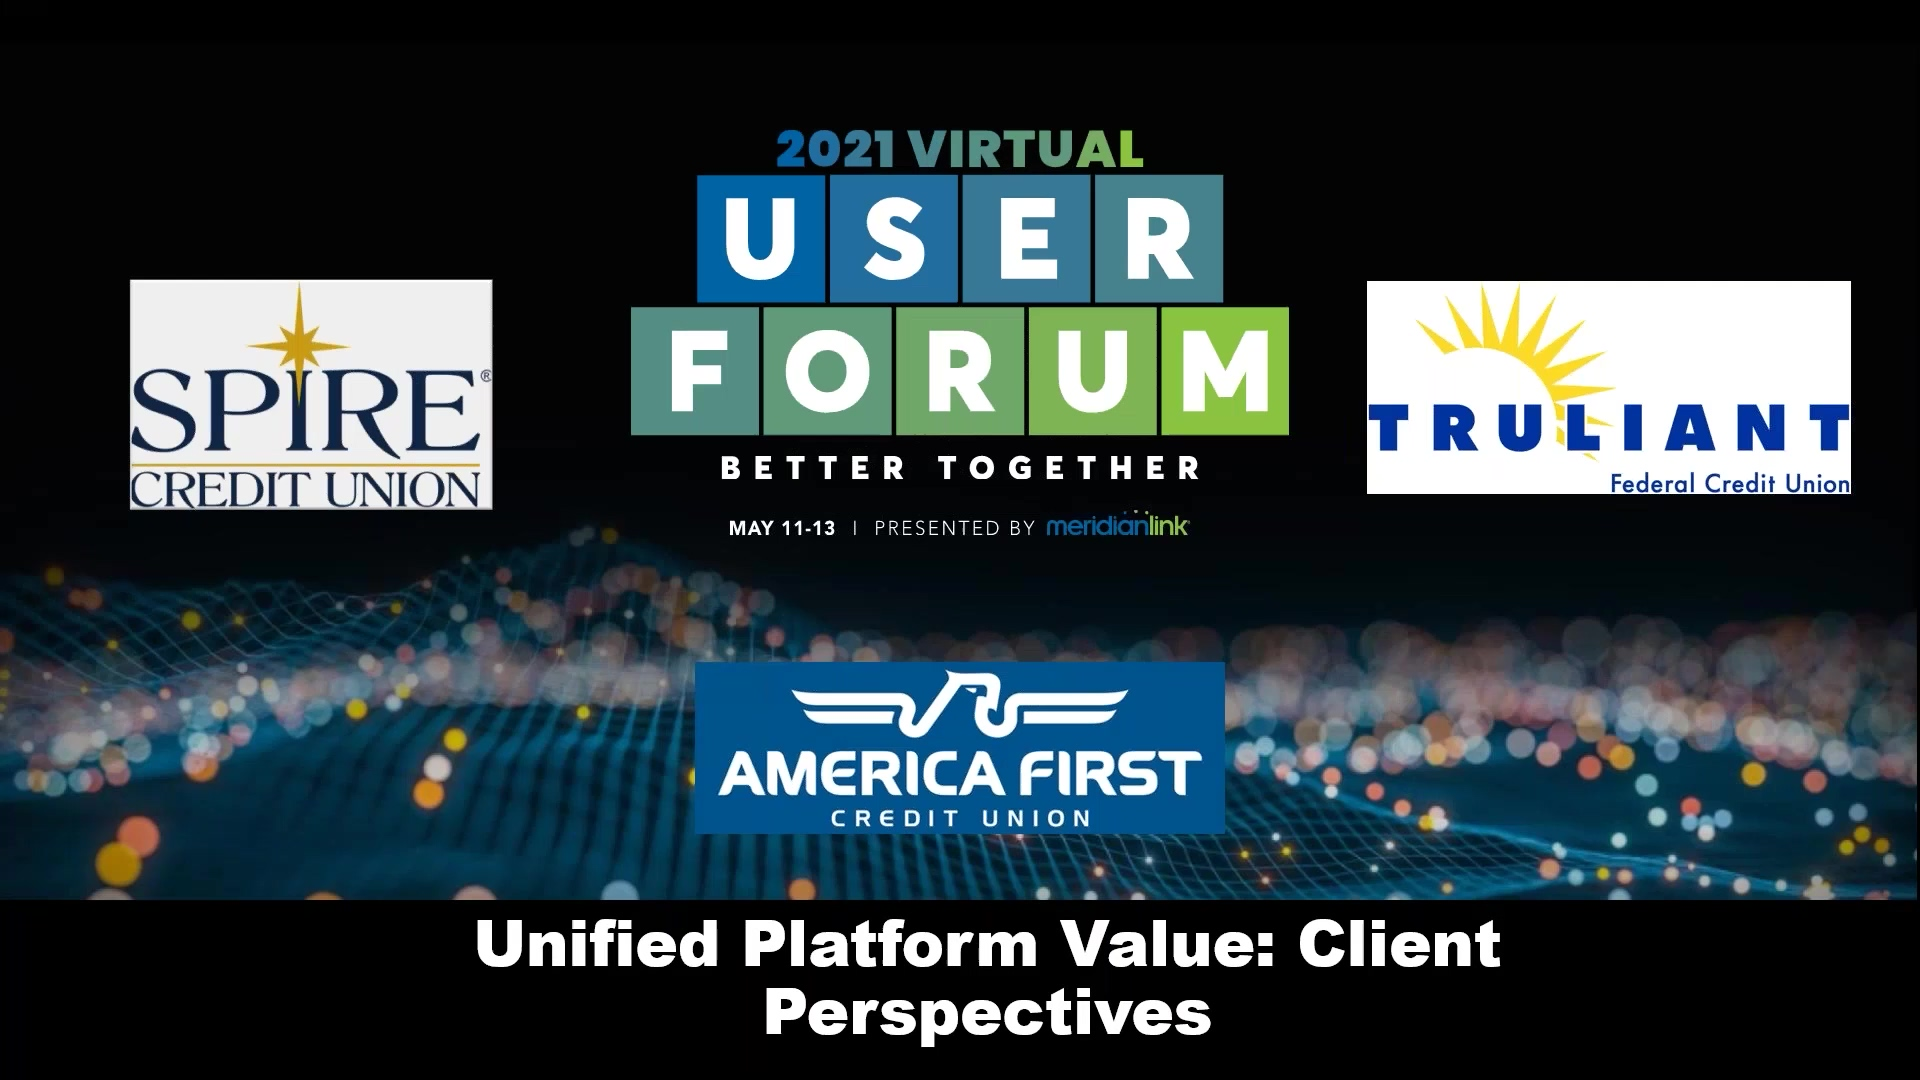 Unified Platform Value Client Perspectives